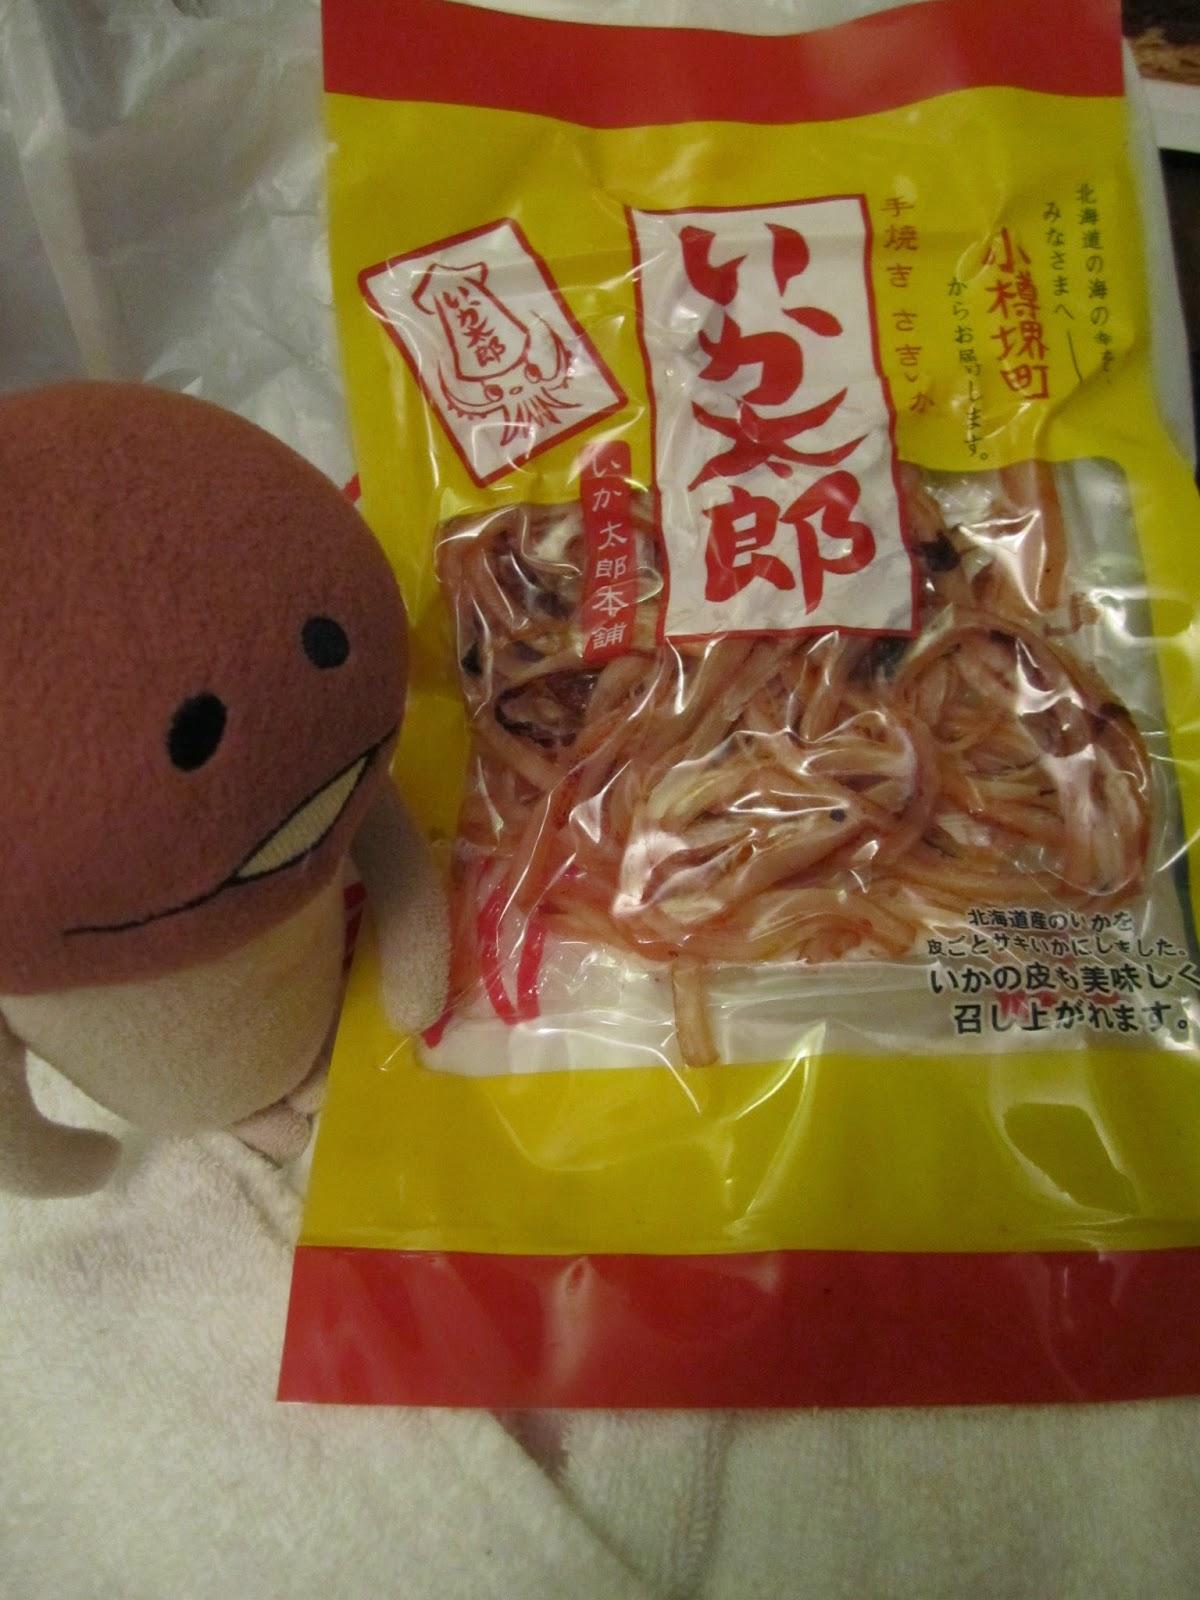 Ika Taro roasted shredded squid